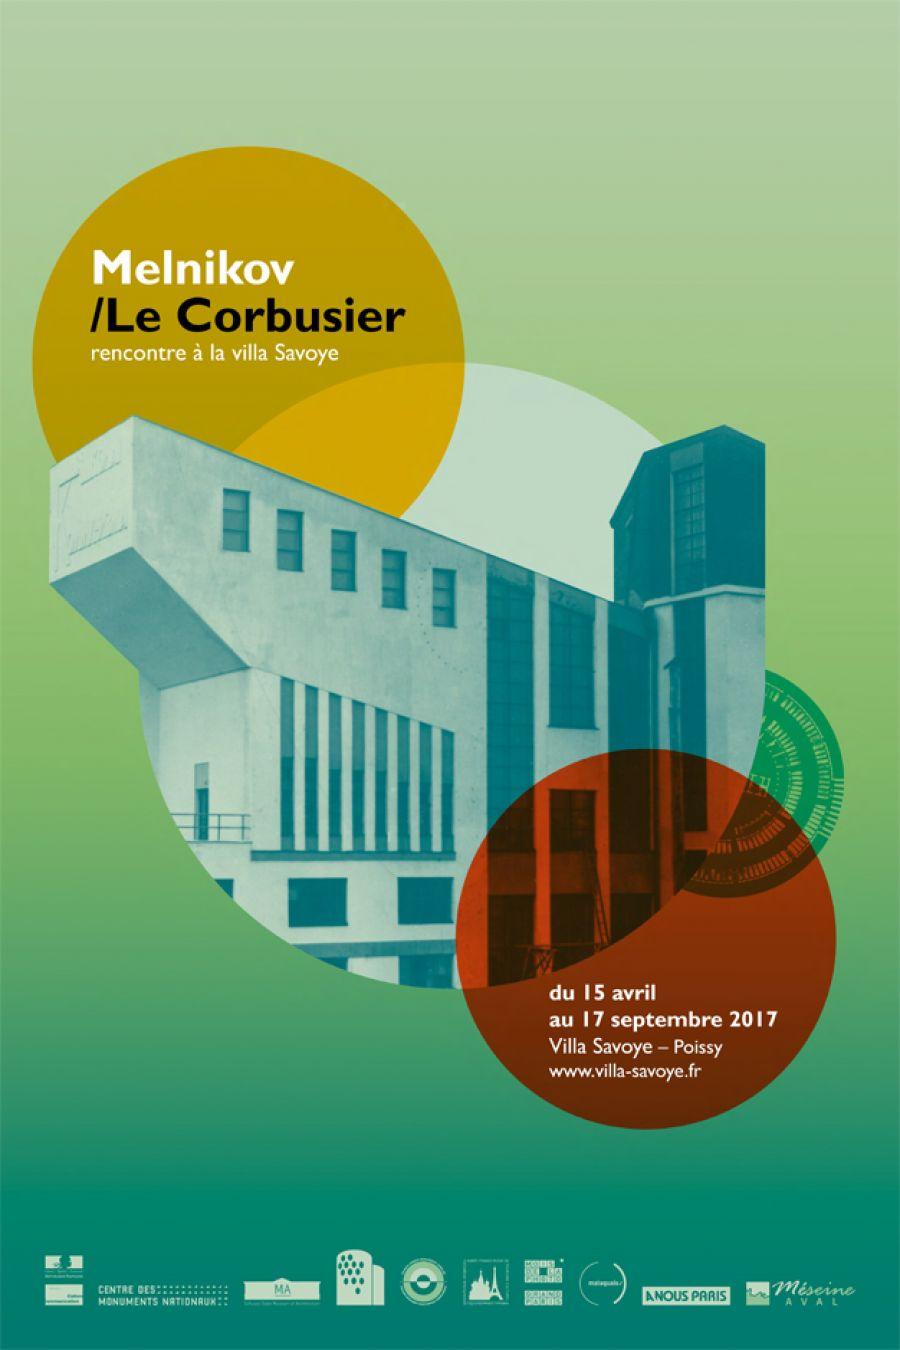 Melnikov/Le Corbusier, rencontre à la villa Savoye - © Le CMN